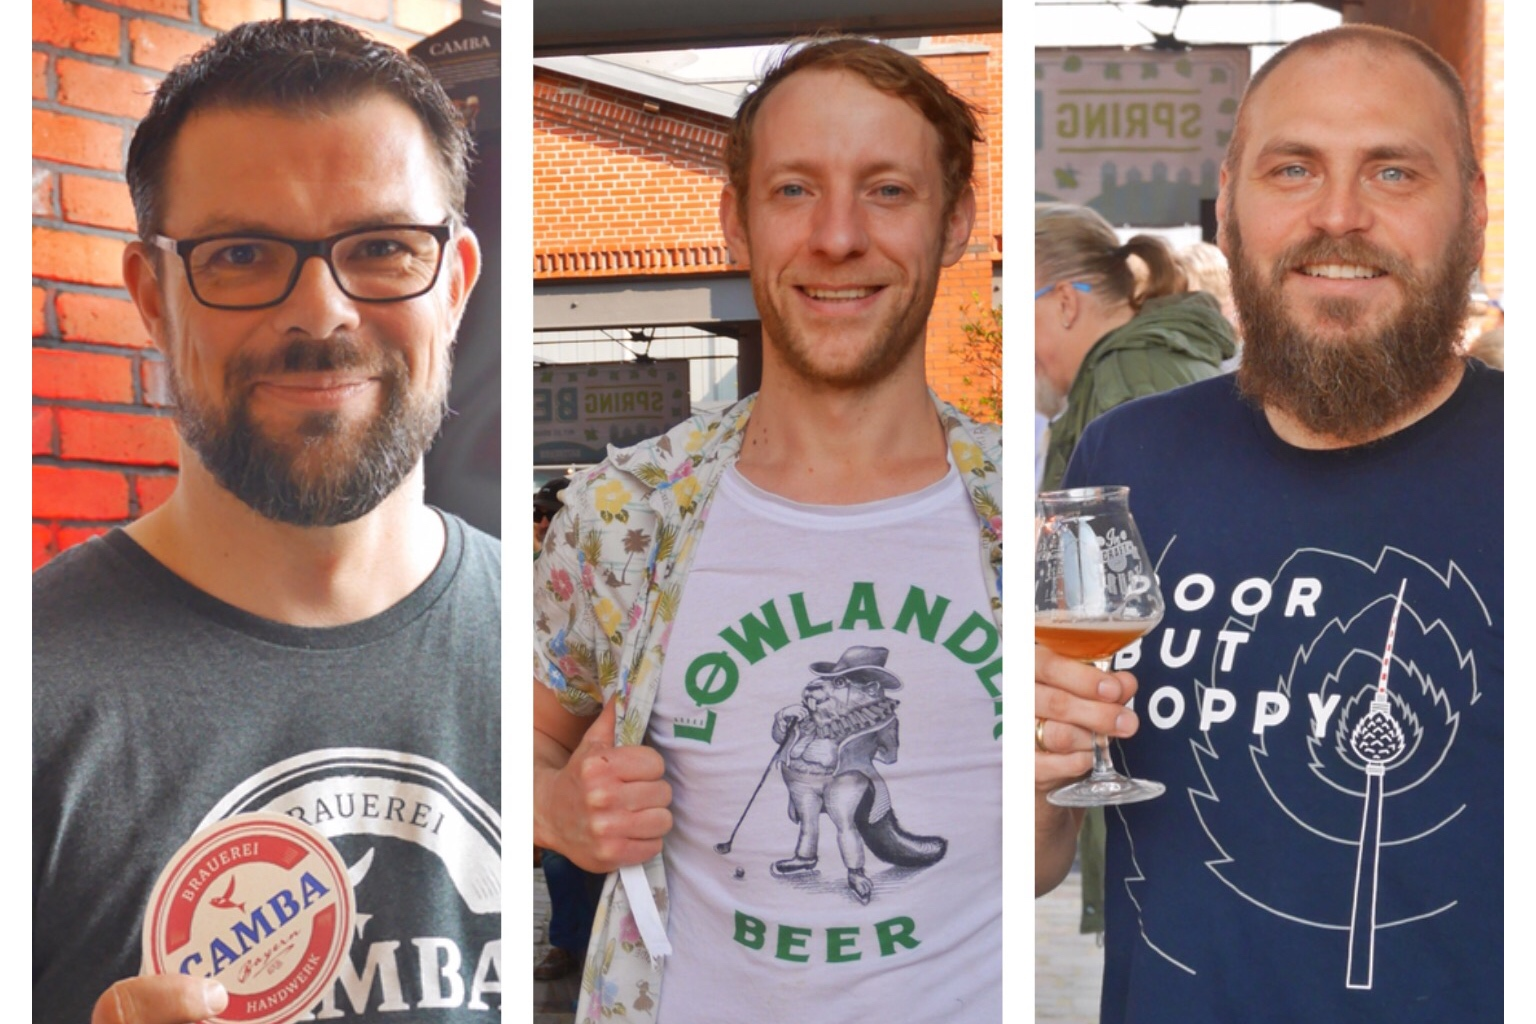 23: Spring Beer Day 2019: Camba, Lowlander, Braeugier